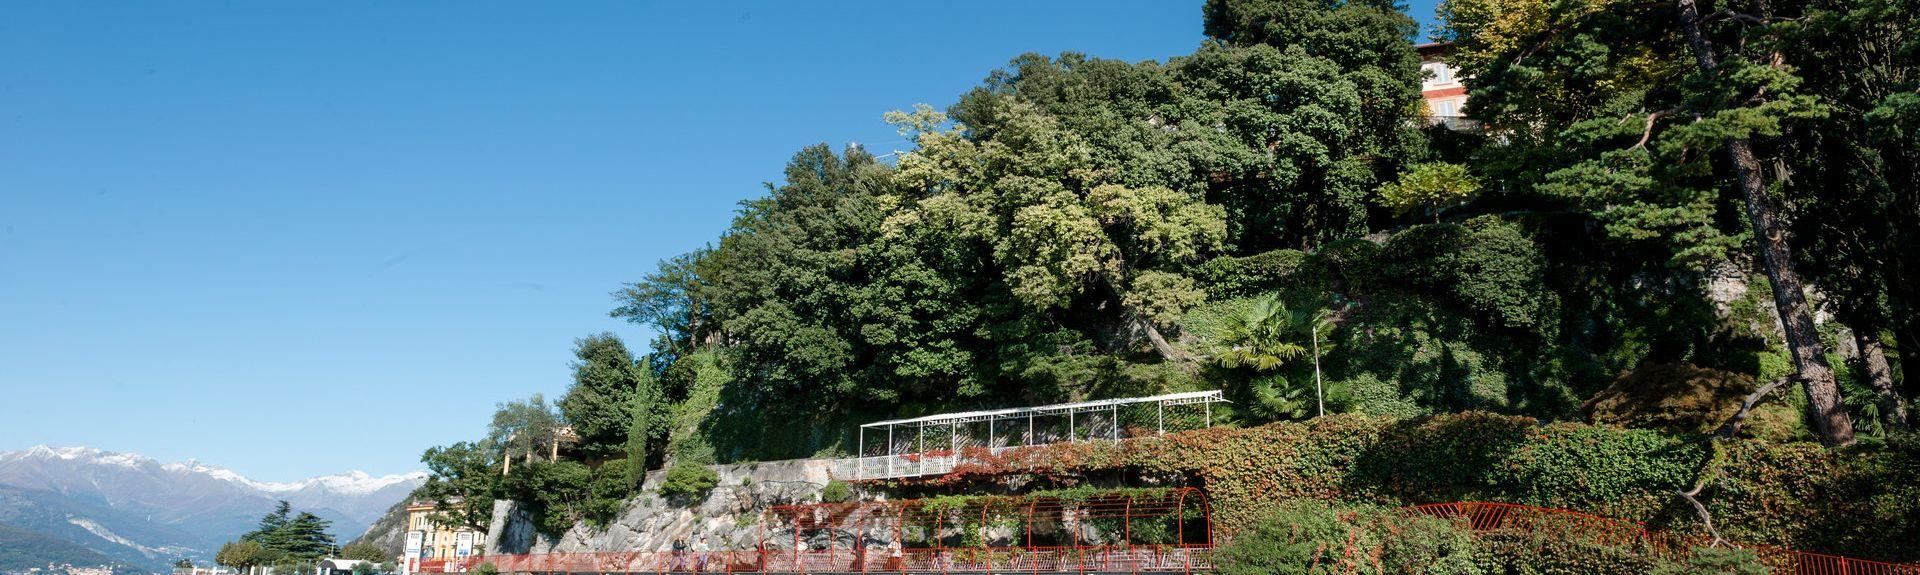 Dizzasco, Lombardije, Italië